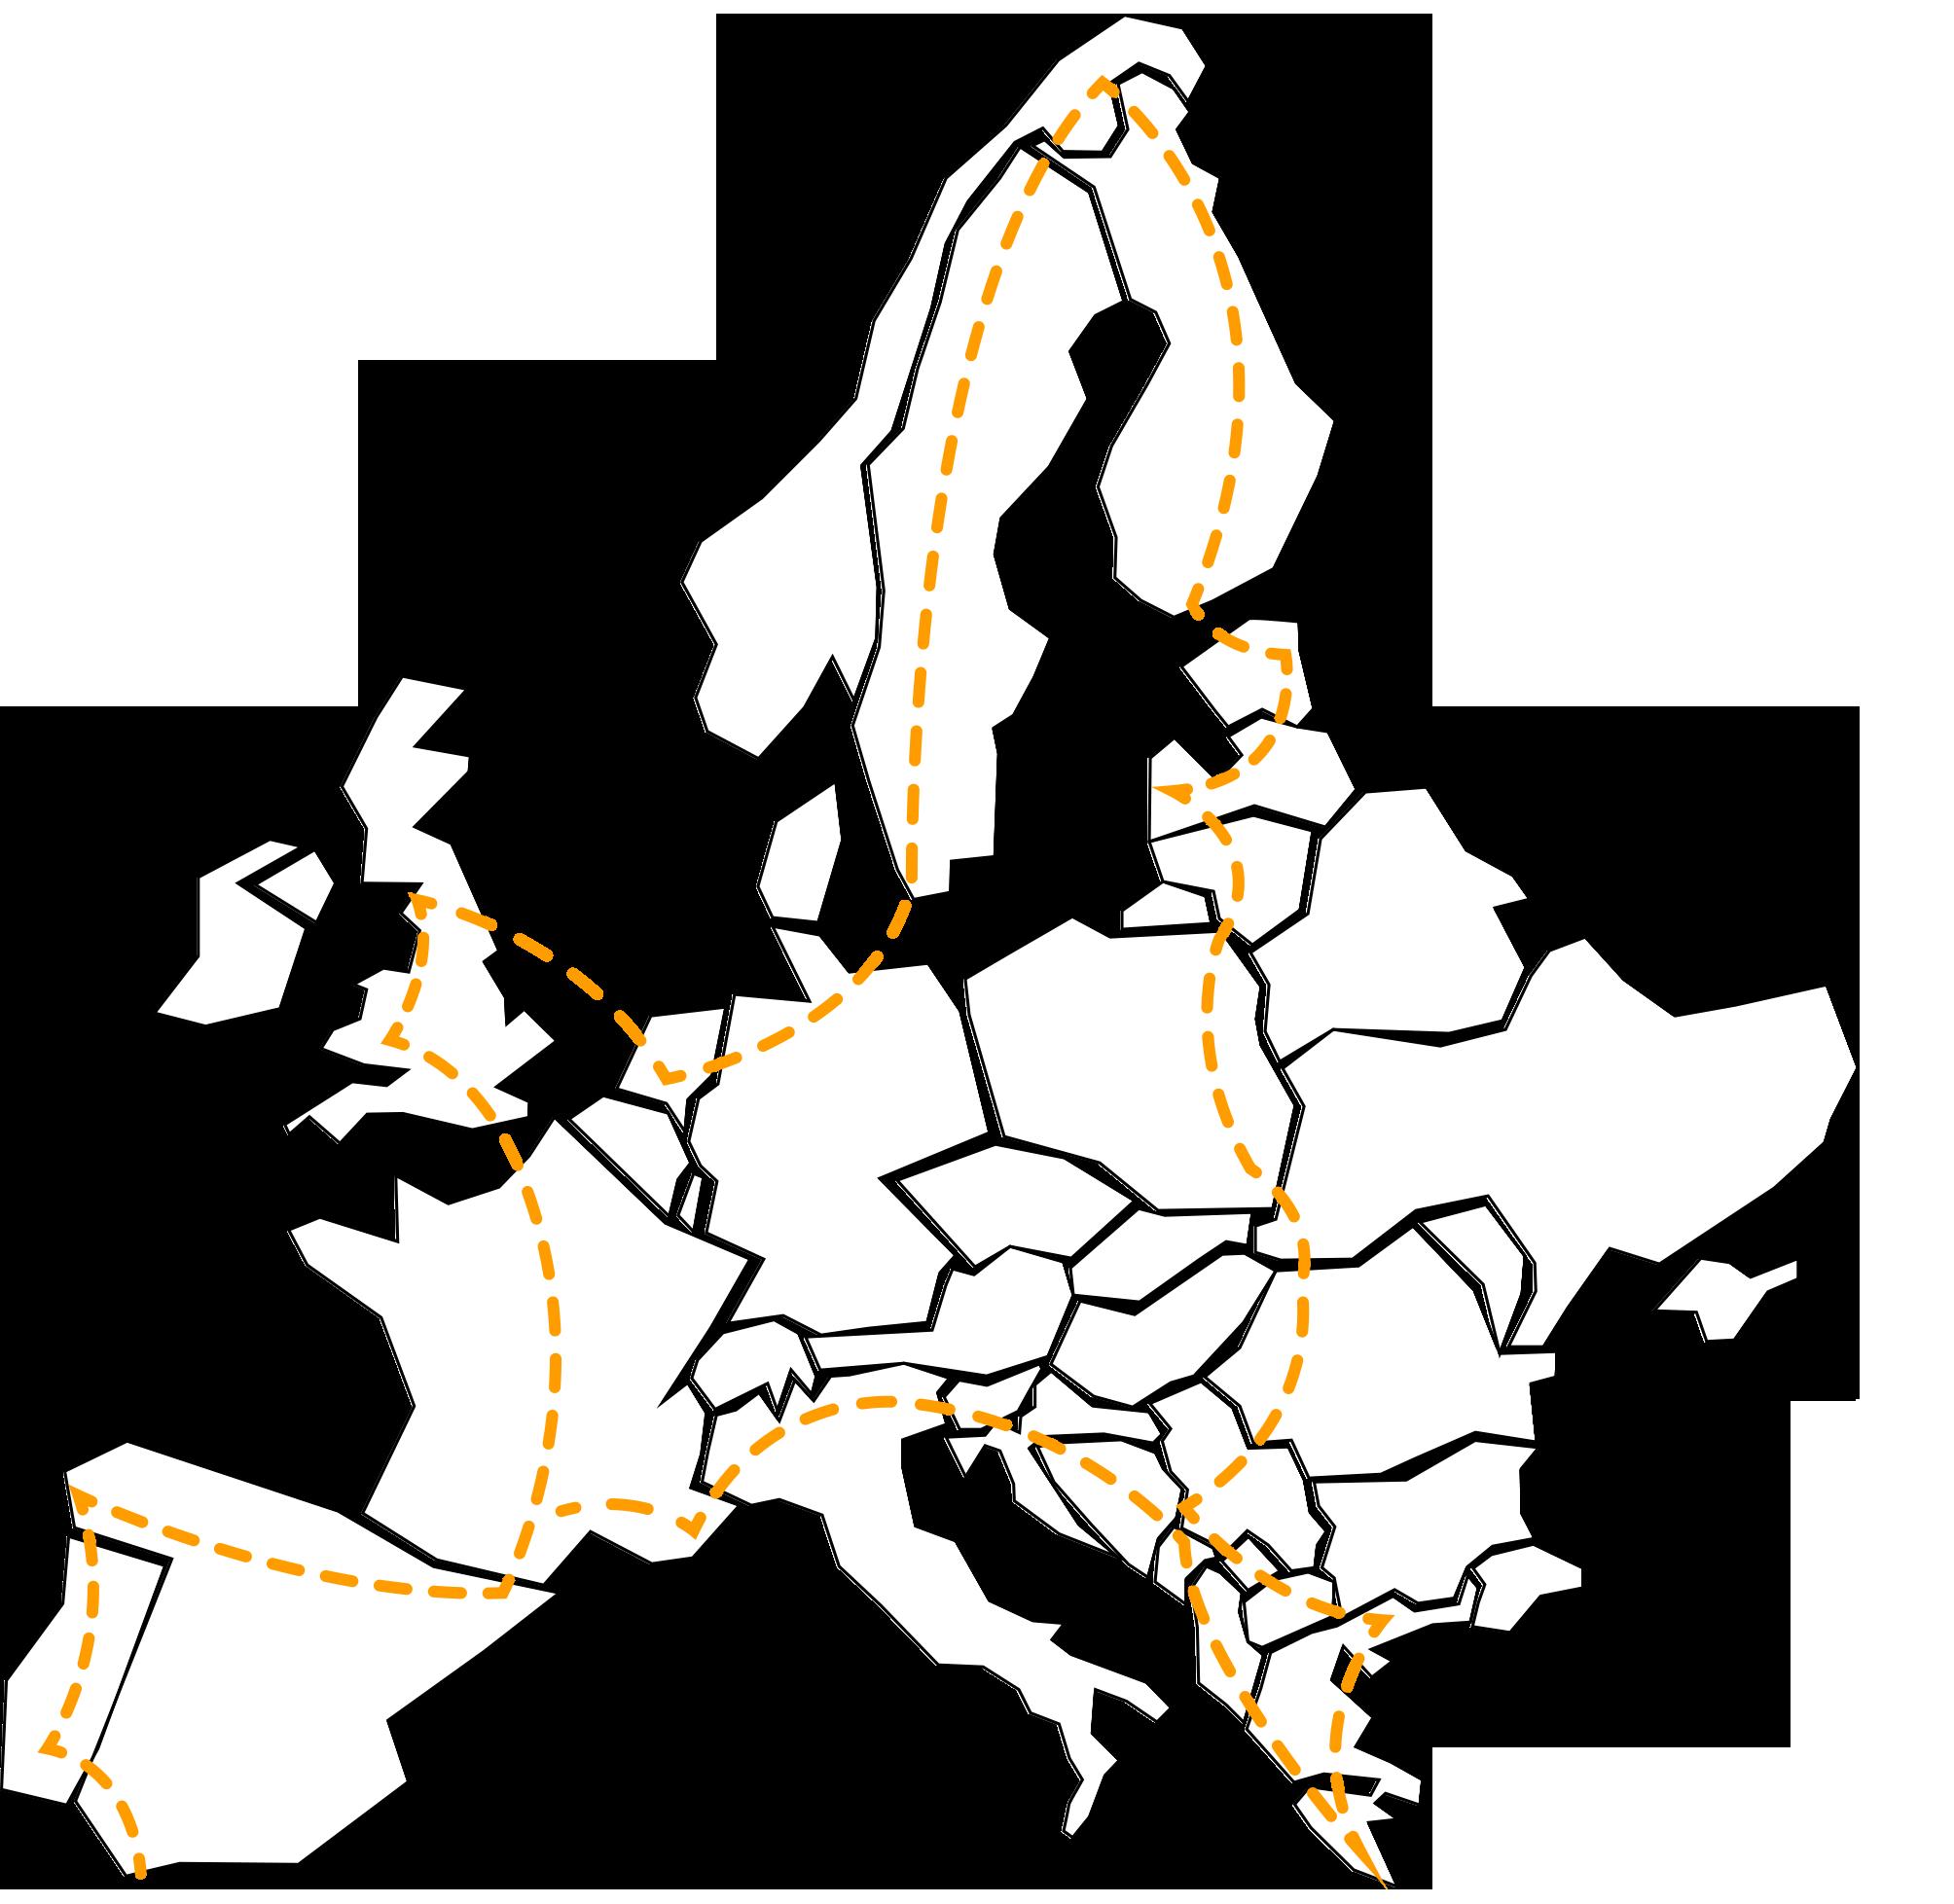 tet-interactive-map-08